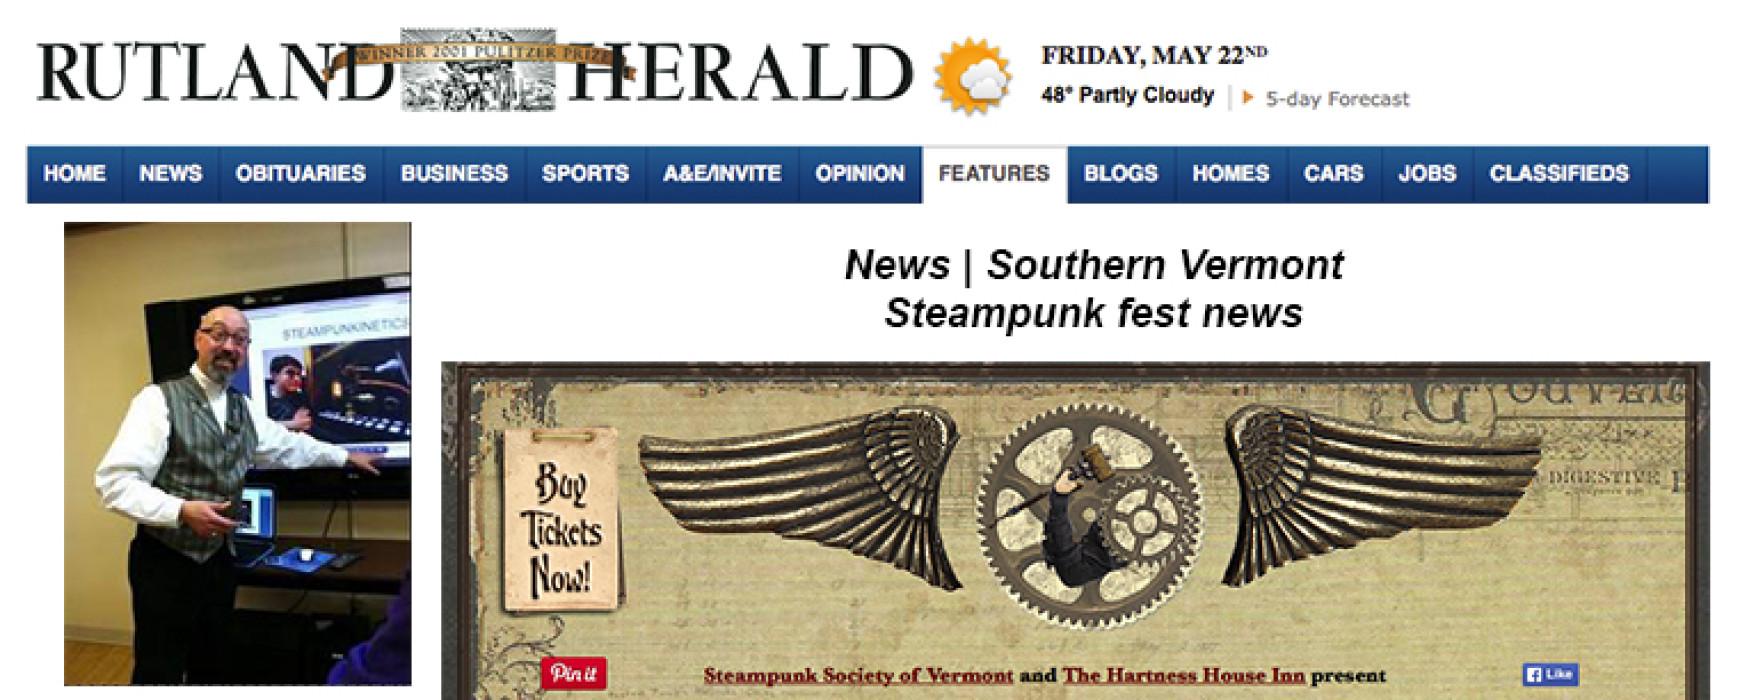 Rutland Herald: Steampunk fest news